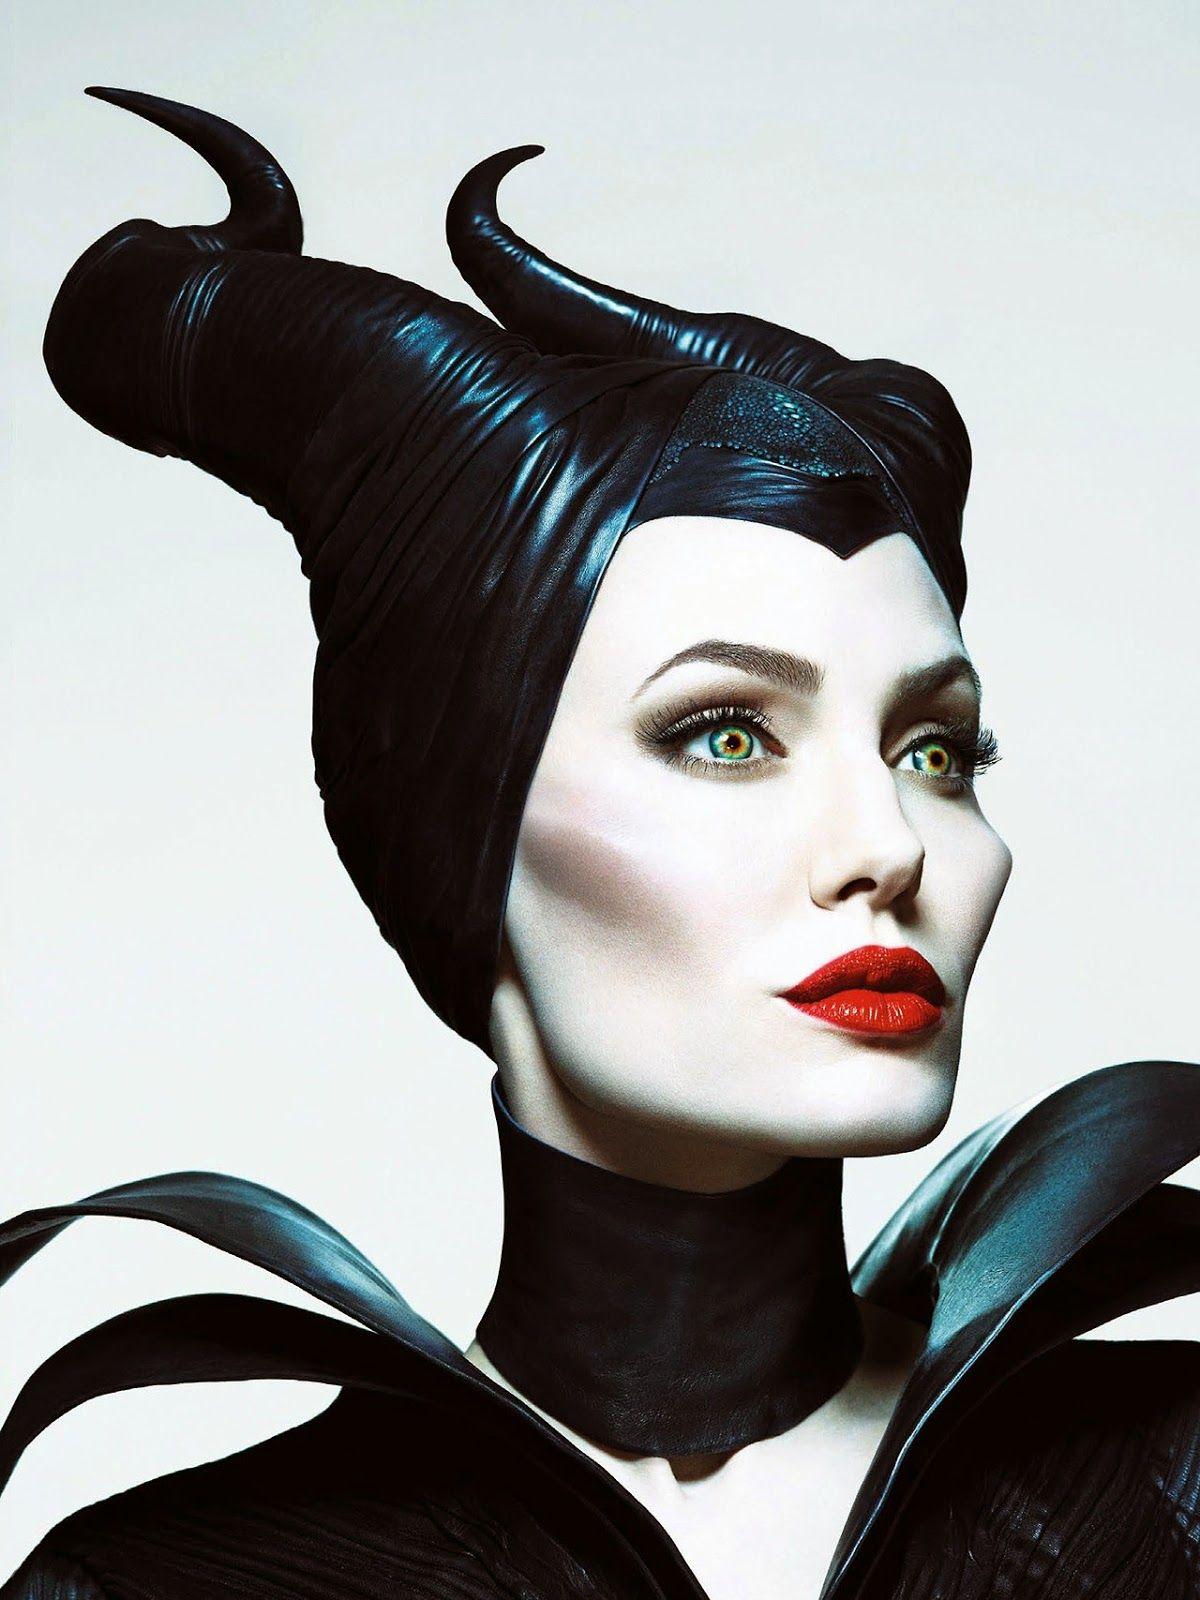 Desenhando A Malevola Drawing Maleficent Malevola Filme